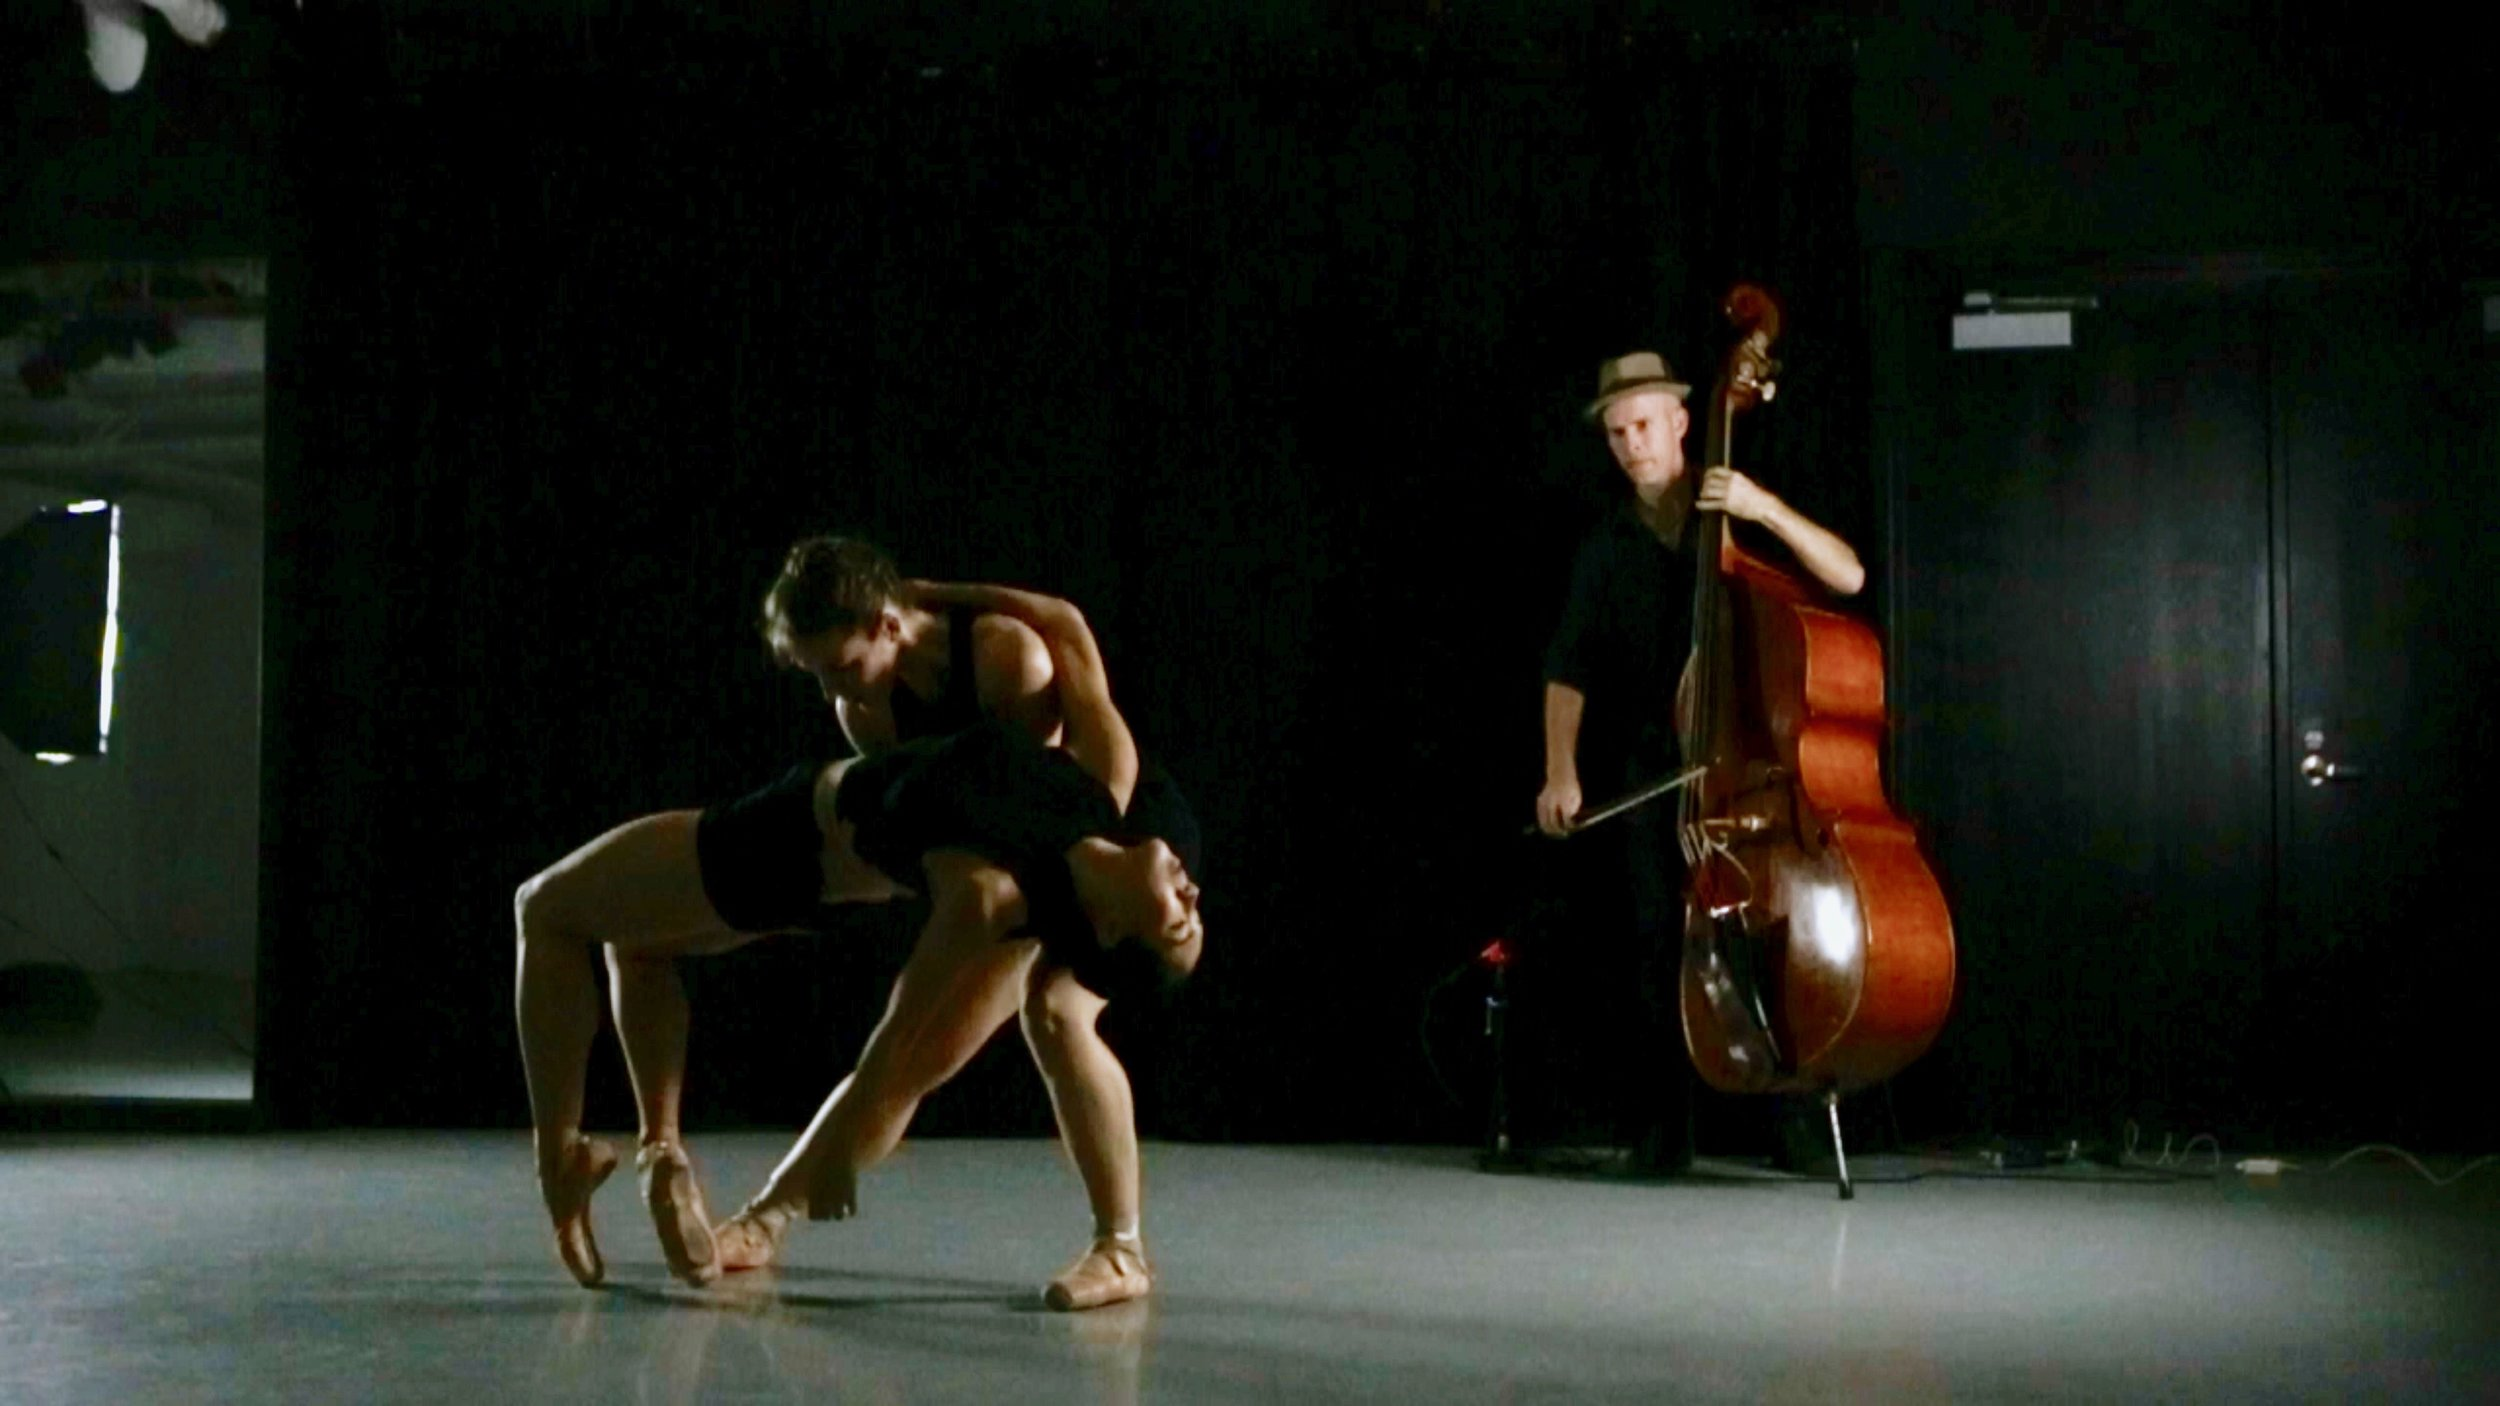 Peter Maness, Tiffany Mangulabnan, Amy Saunder in konverjdans' 'Convergence/Divergence' at Gibney Dance Center